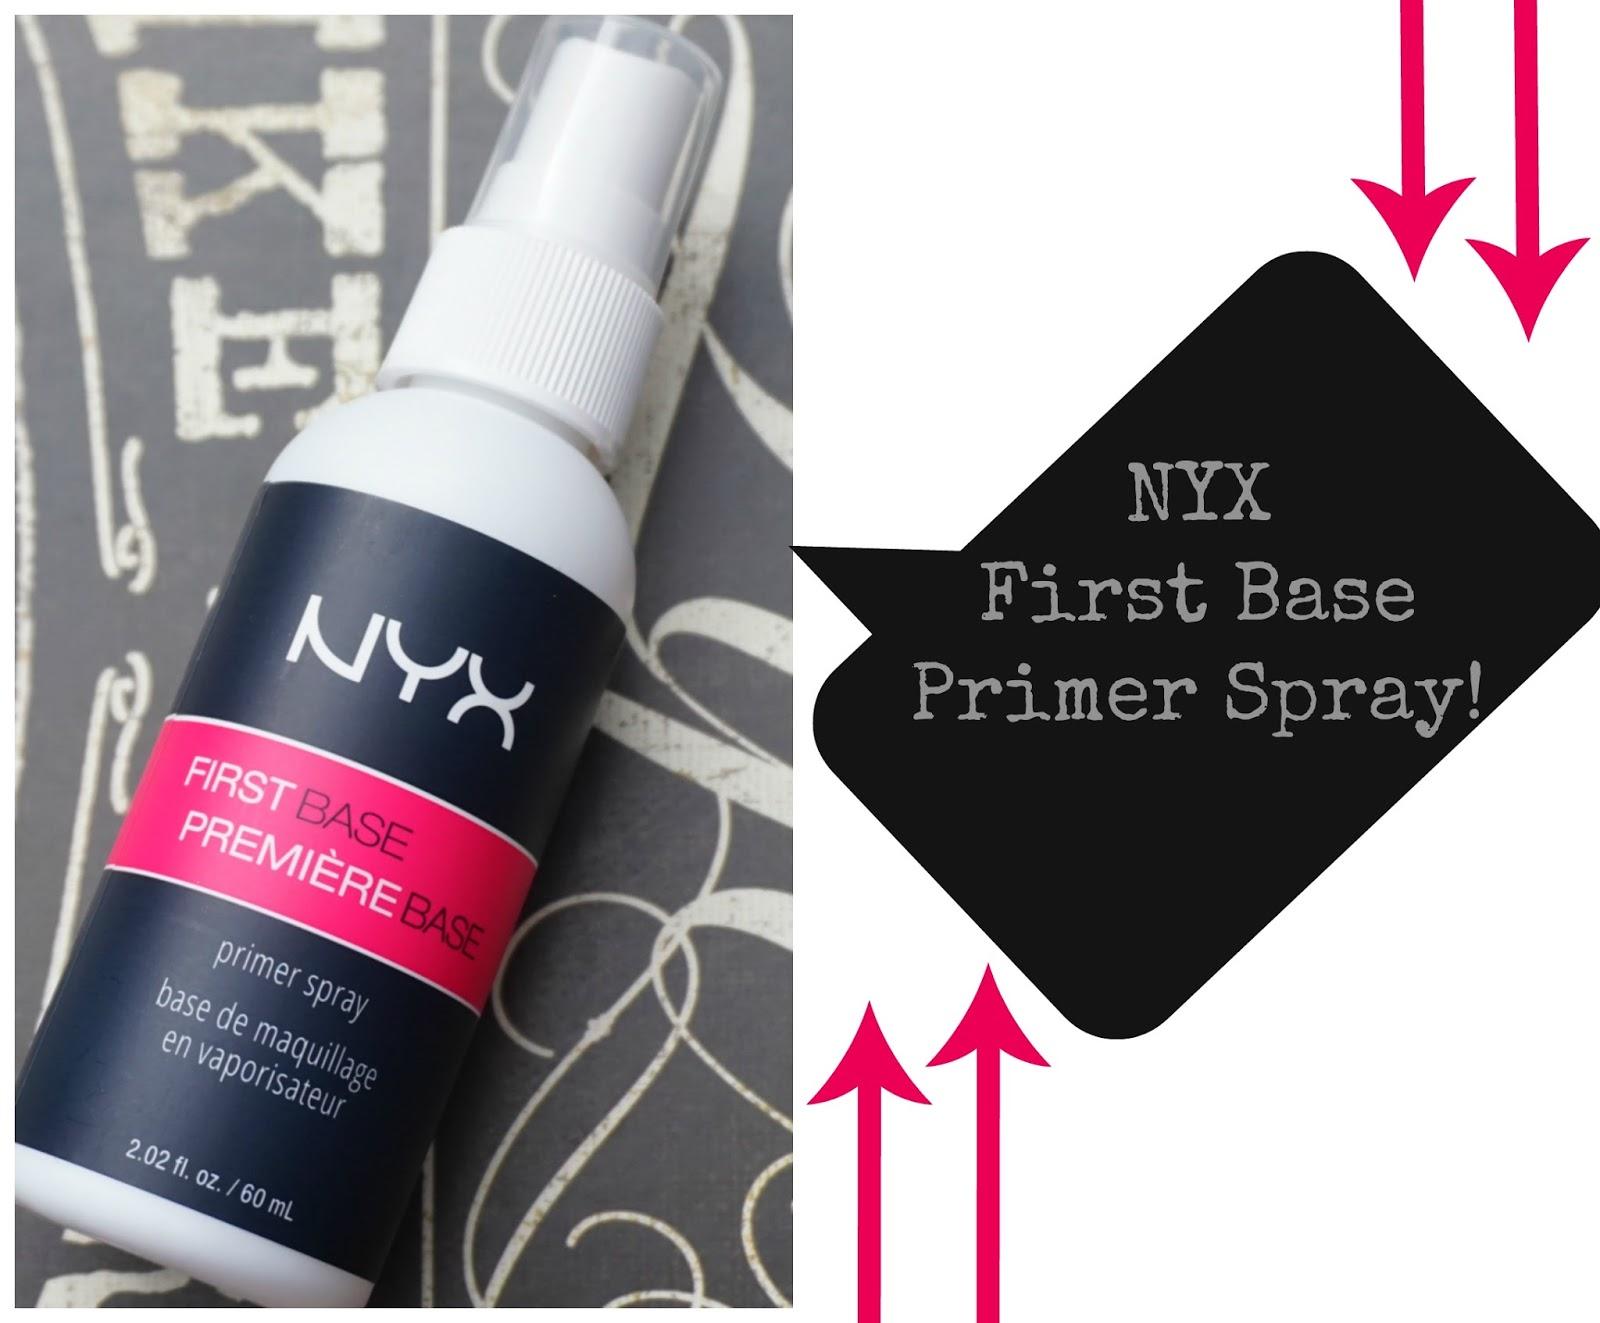 makeup fashion royalty review nyx first base primer spray. Black Bedroom Furniture Sets. Home Design Ideas